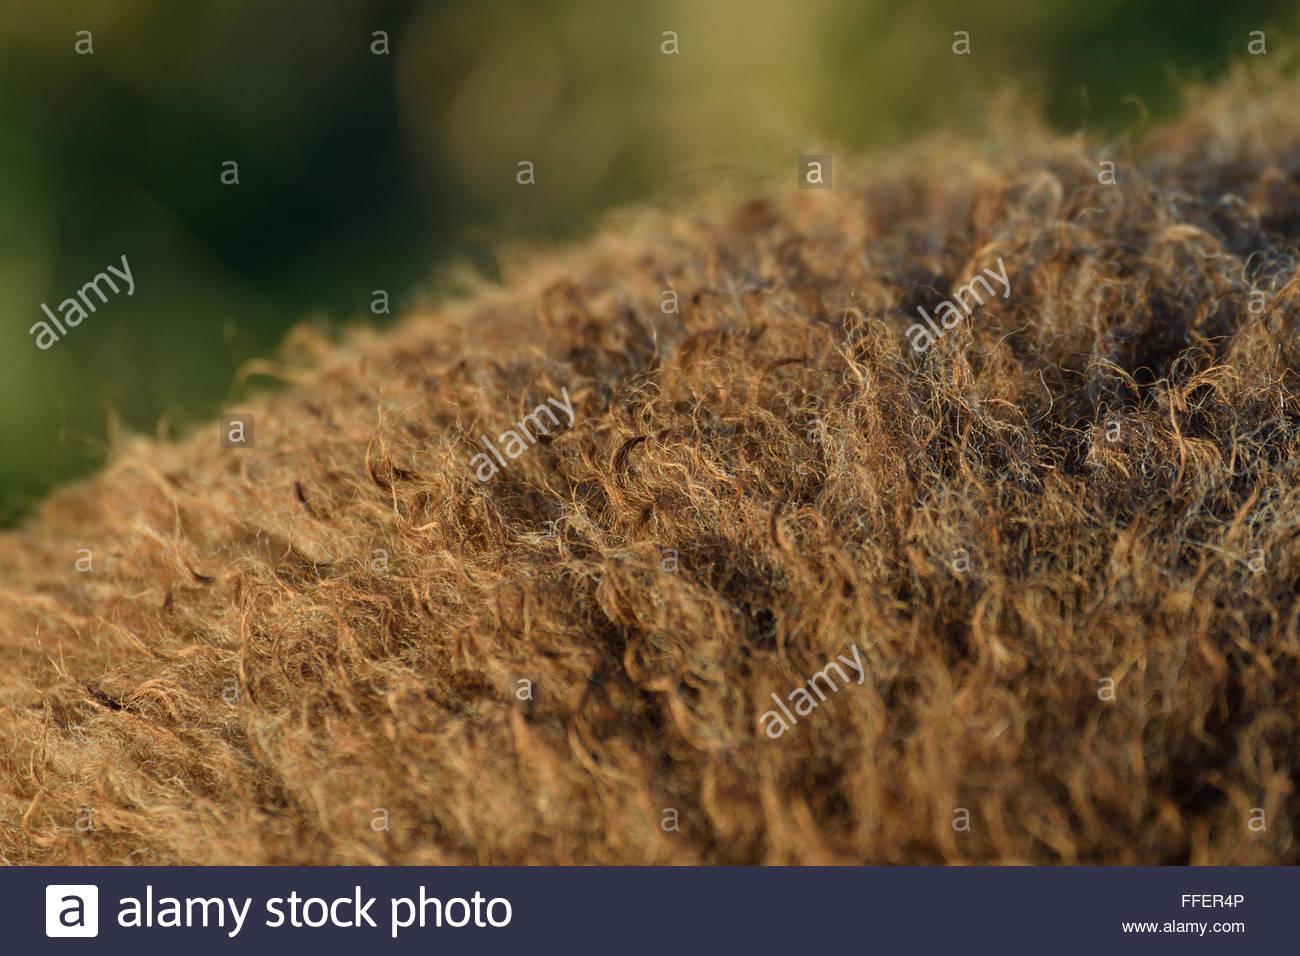 Lamb wool - Stock Image